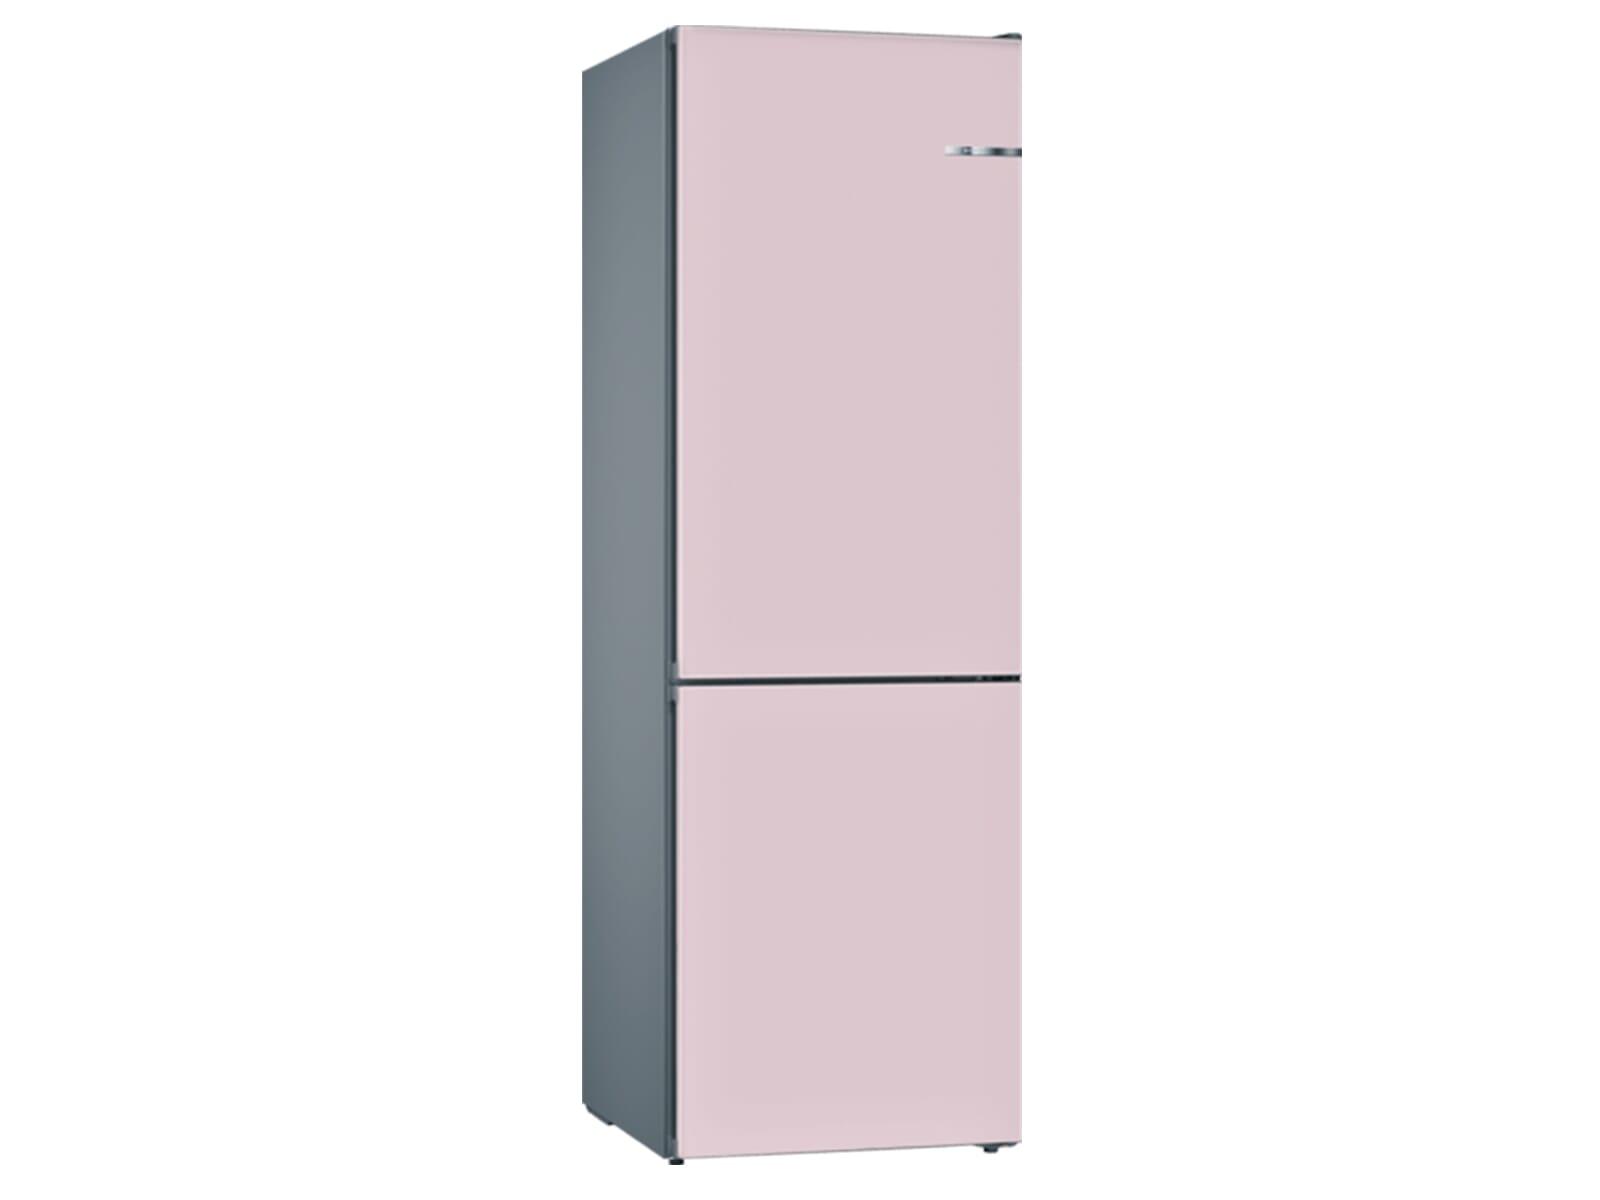 Bosch Vario Style Kühlschrank : Bosch kvn ip a stand kühl gefrier kombination edelstahl pastellrosé